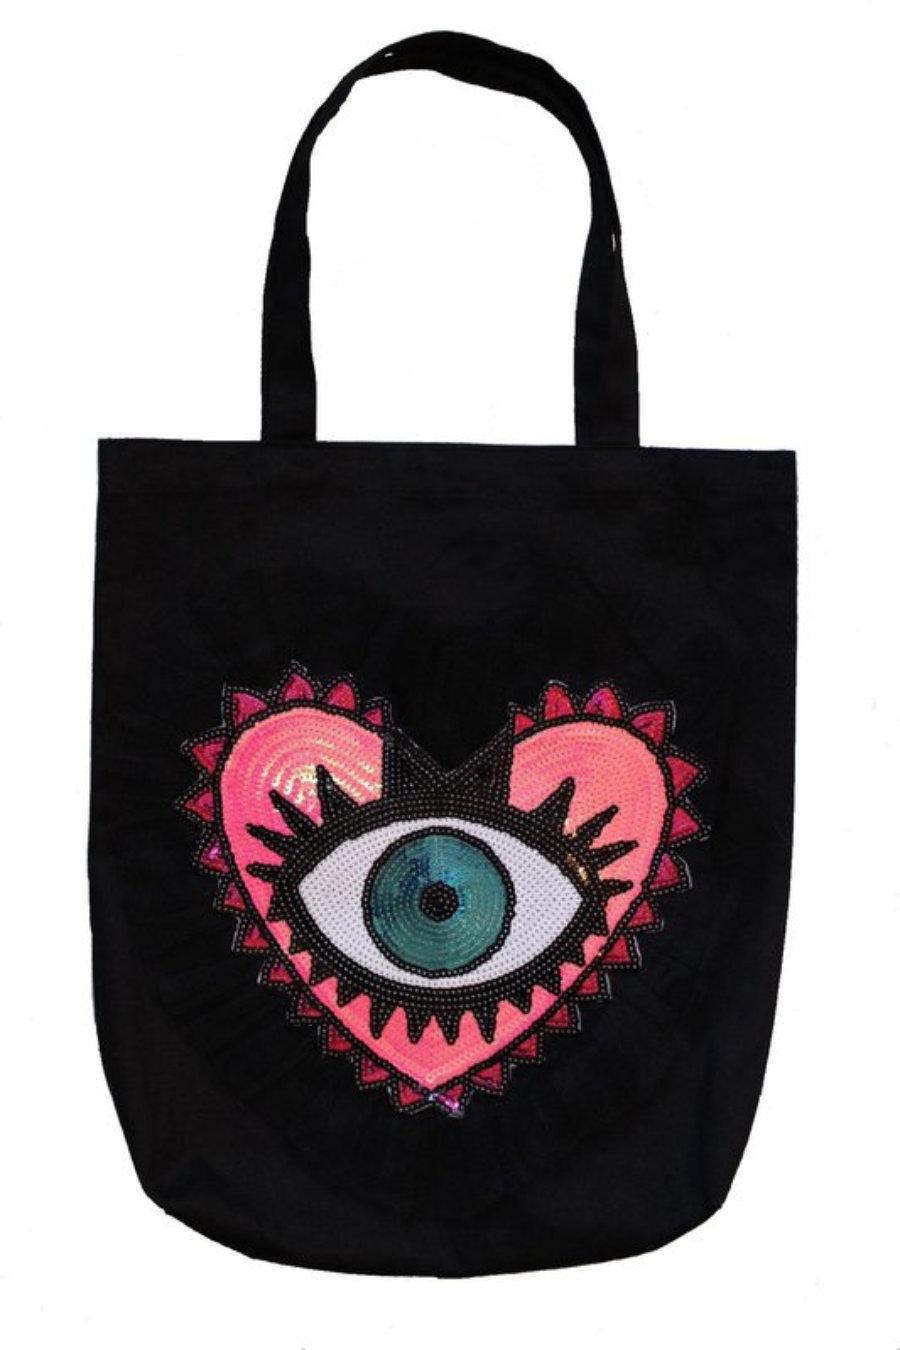 Tote bag eye